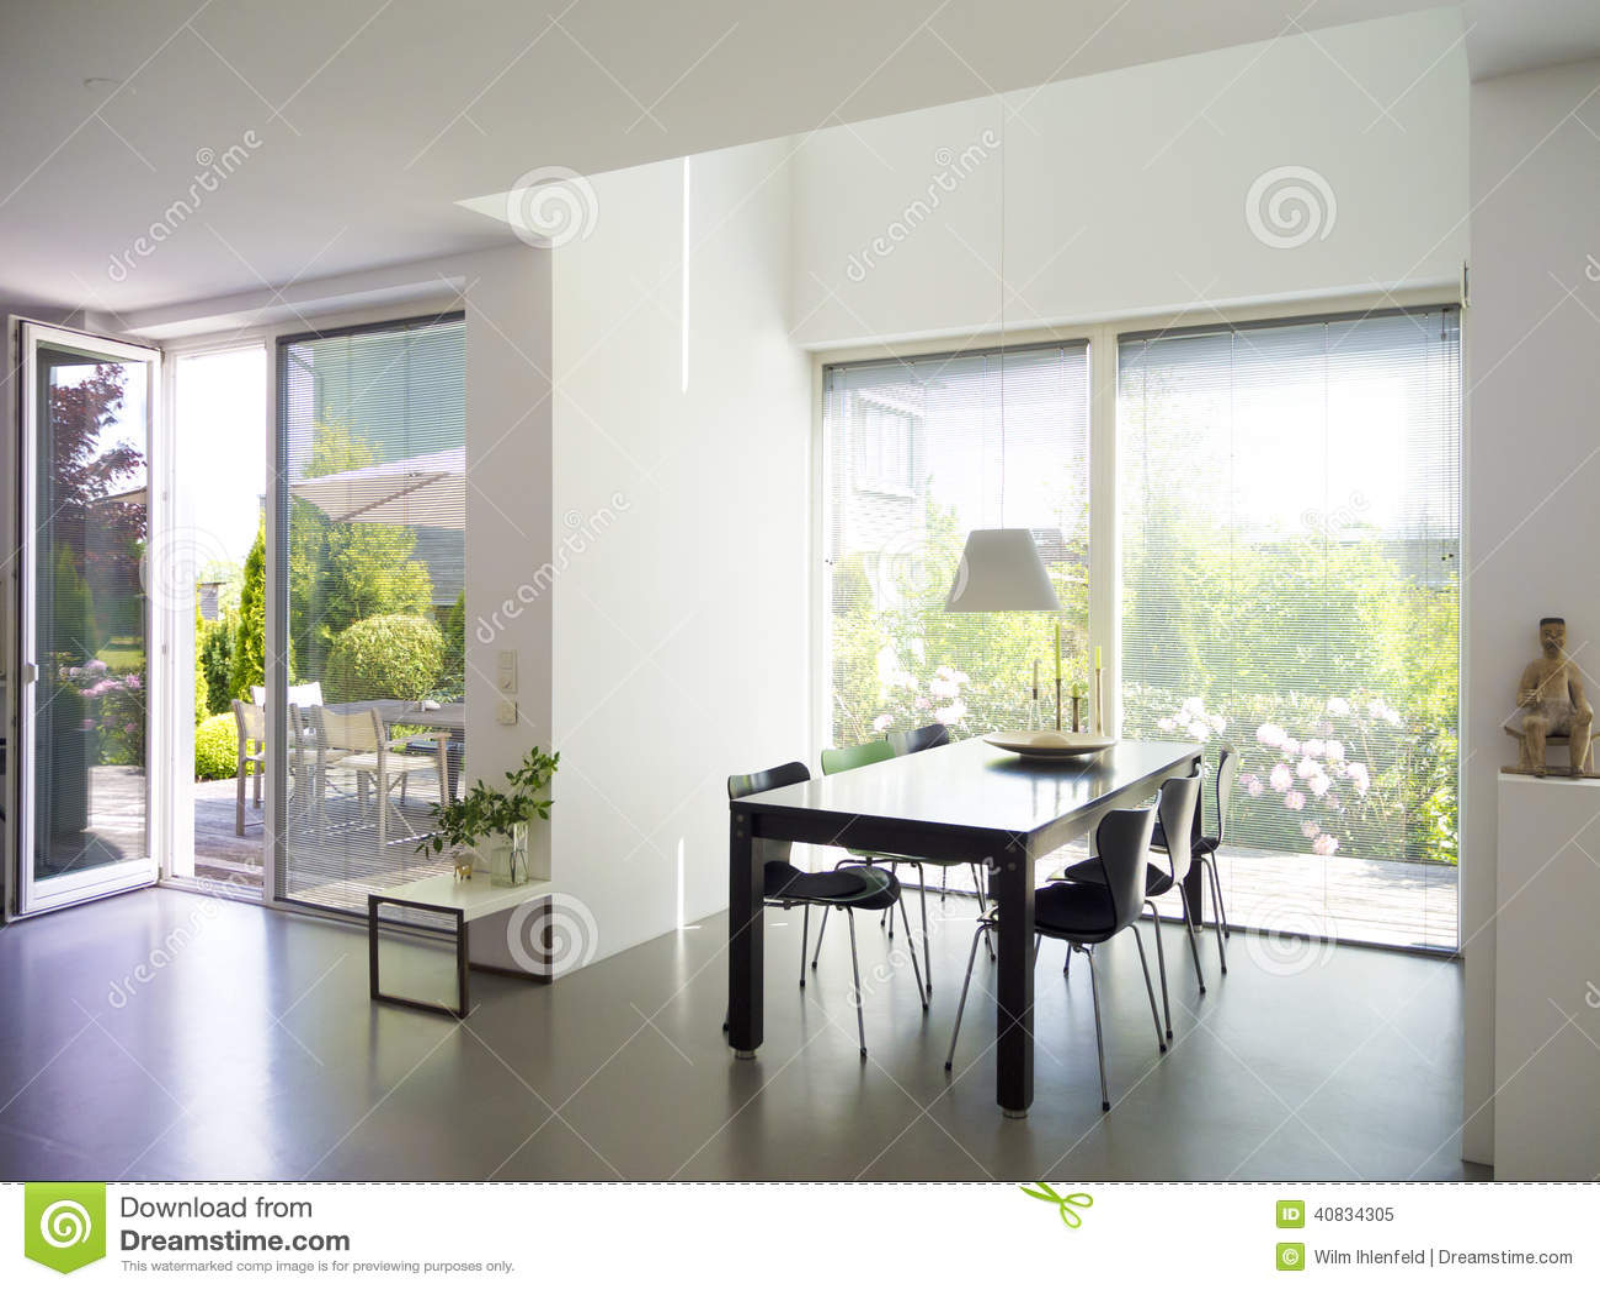 Sala de jantar com janelas francesas